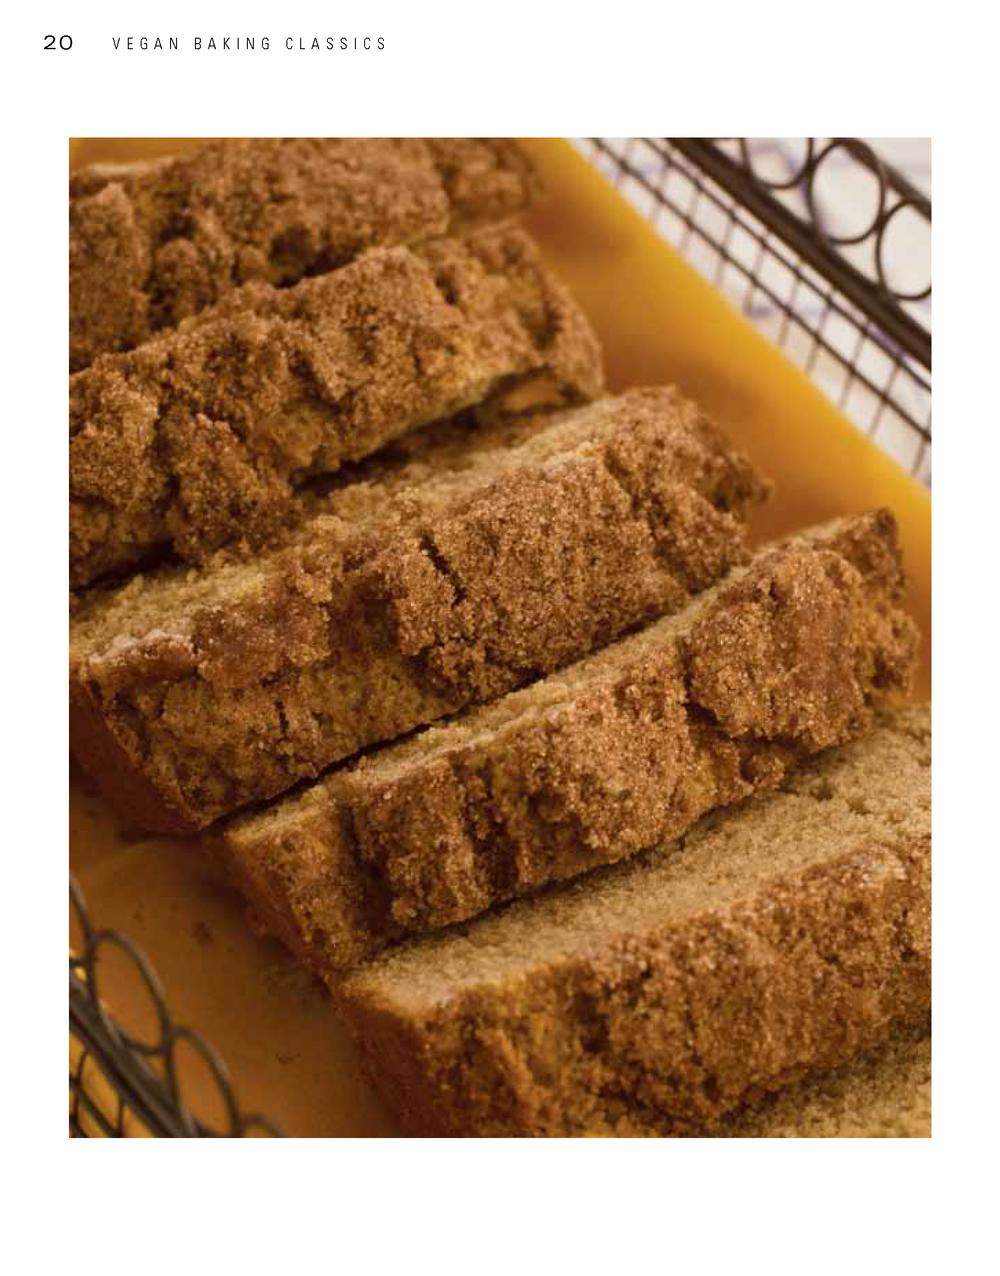 Vegan Baking Classics_Page_08.png